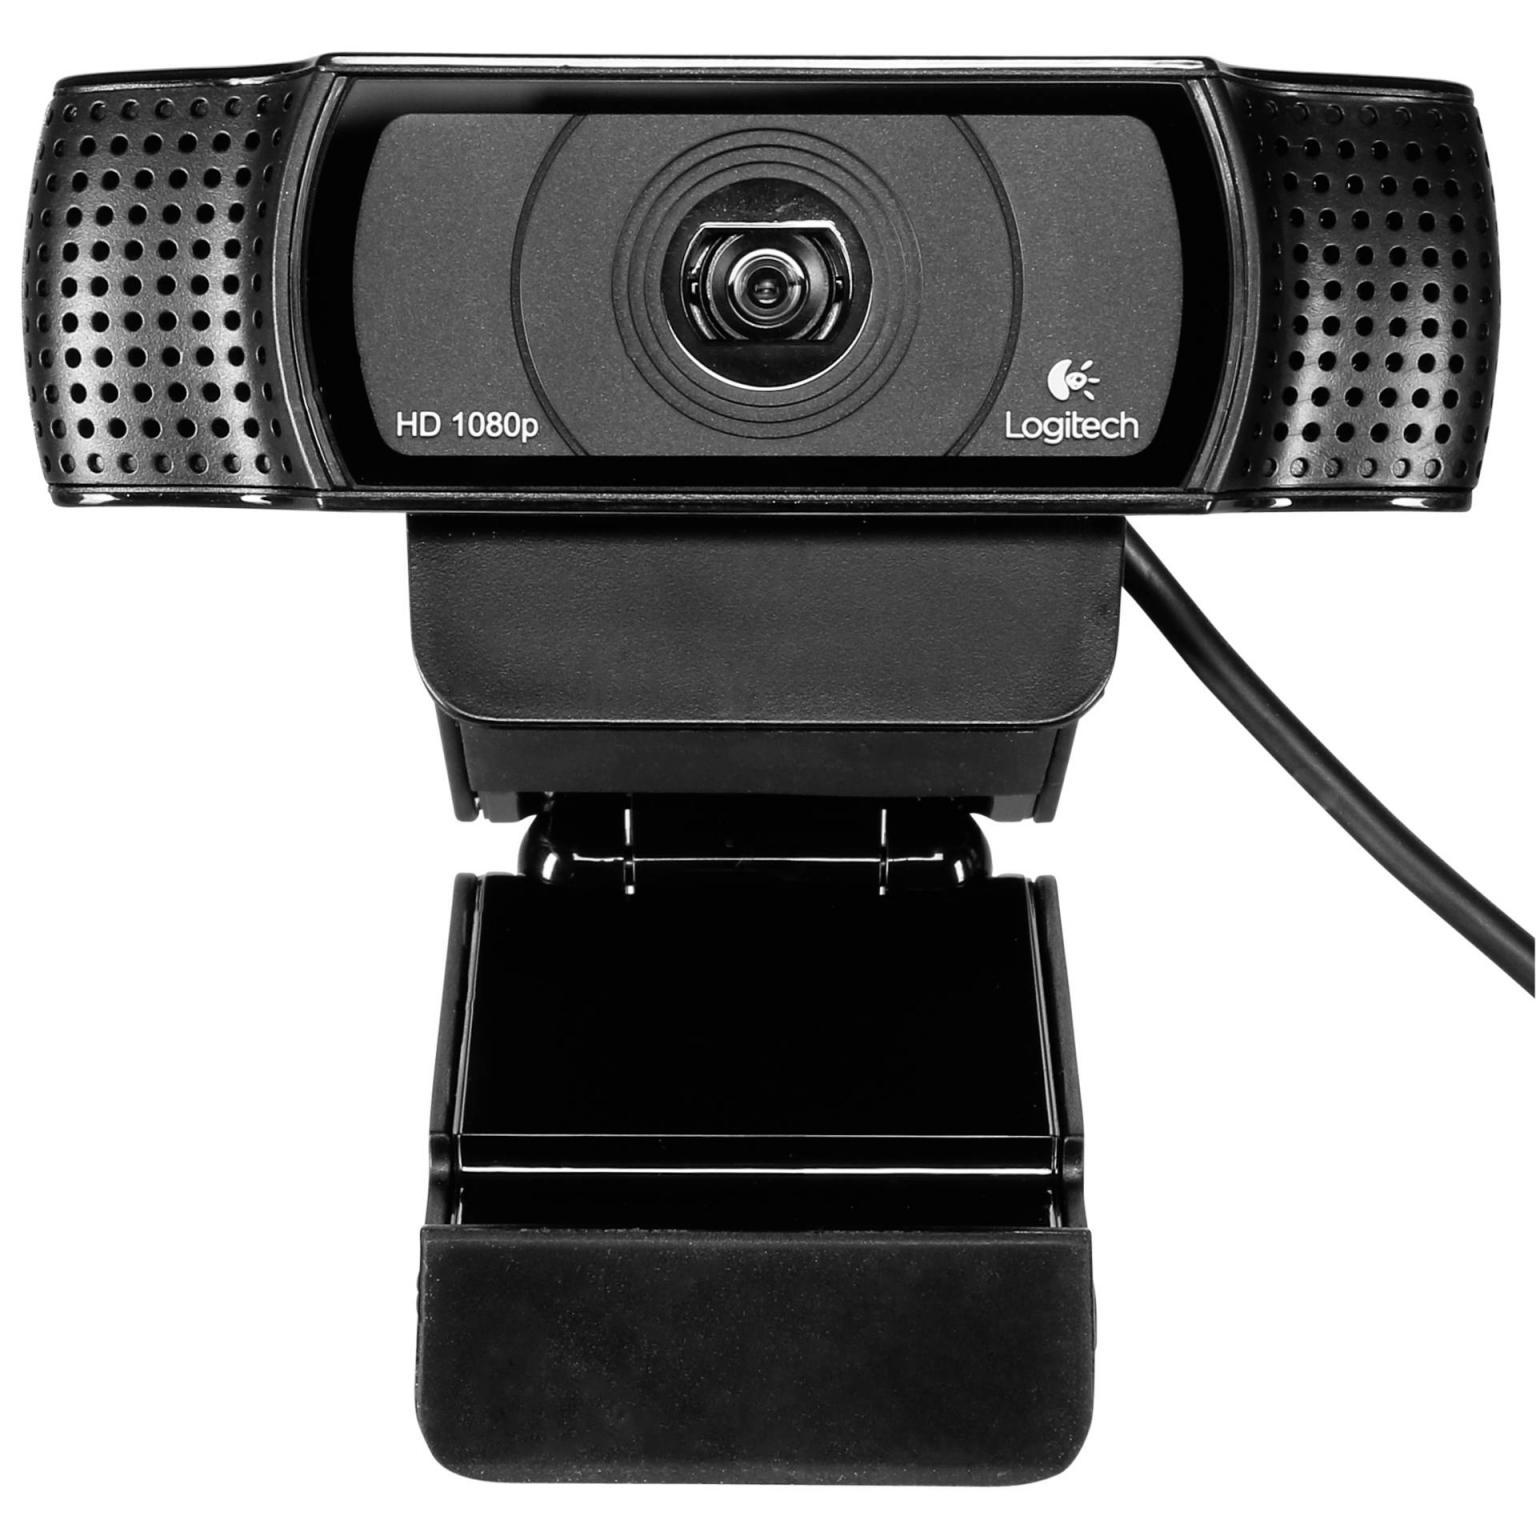 HD Pro Webcam C920 - Logitech